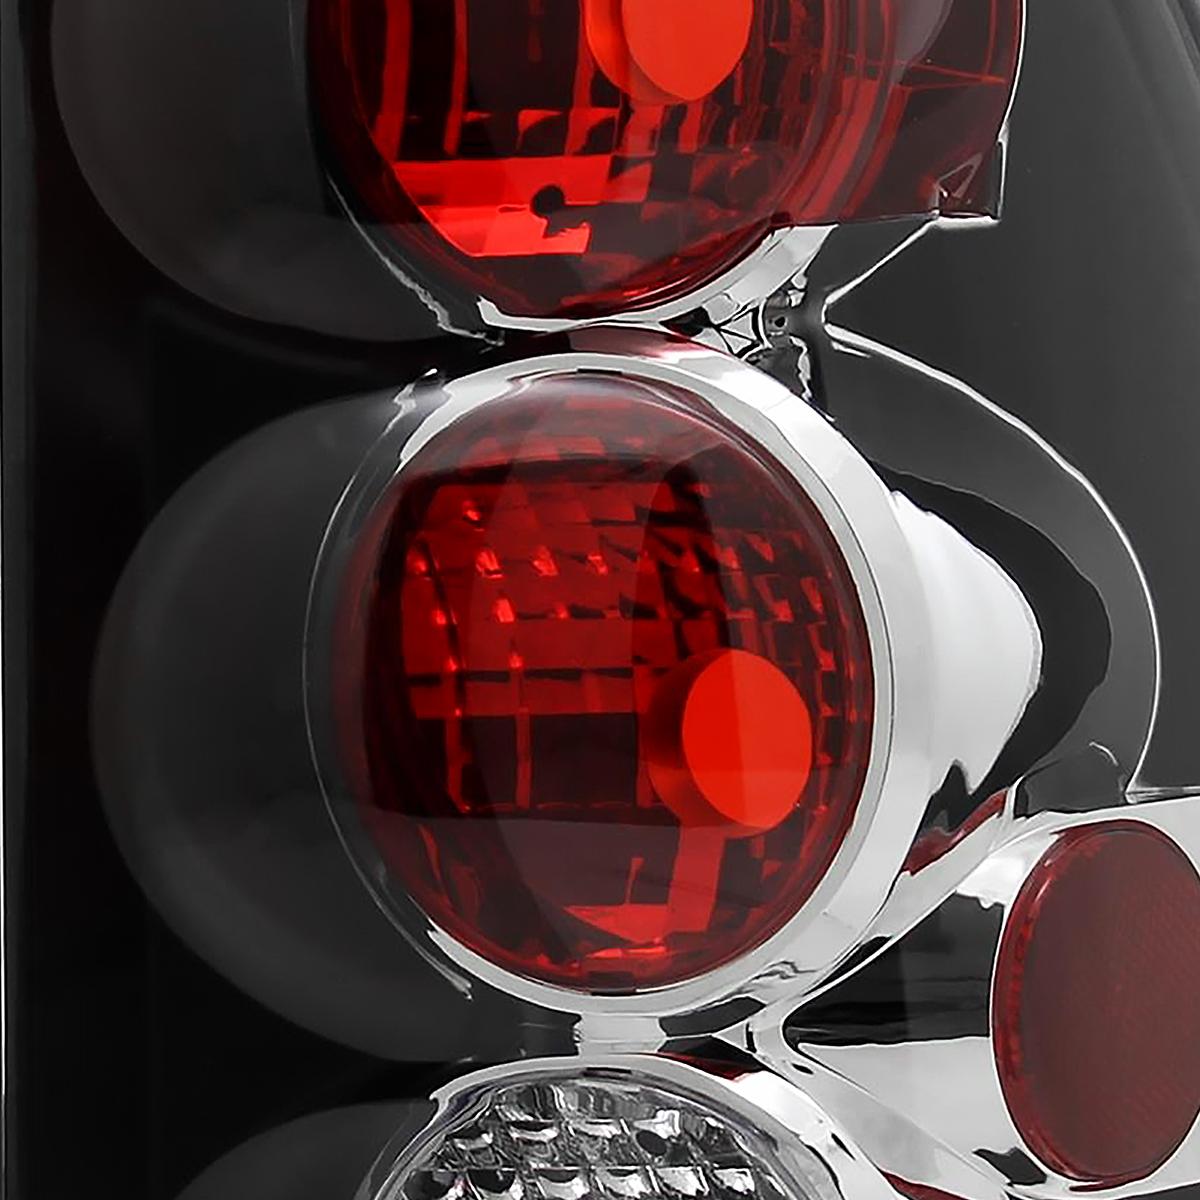 20022009 Chevy Trailblazer Black Tail Lights Brake Lamp | eBay